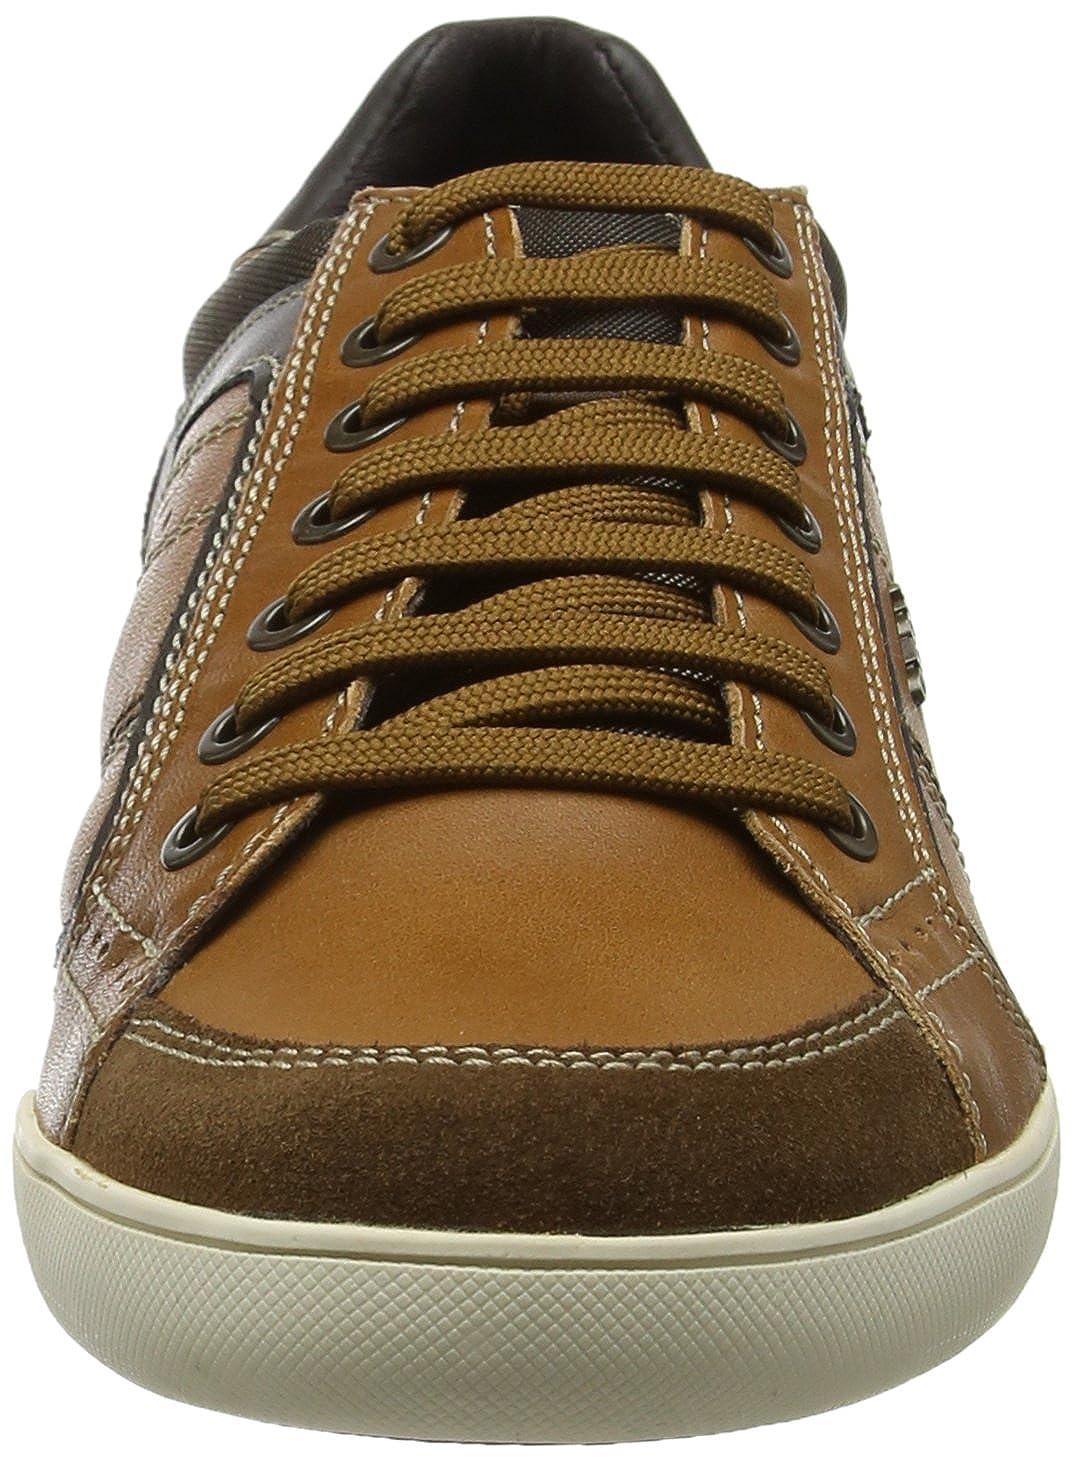 Geox Men's U Kristof Sneakers 39 EU/6 M US|Cognac/ US|Cognac/ M Browncotto B07719PQ9Q 74ecf3